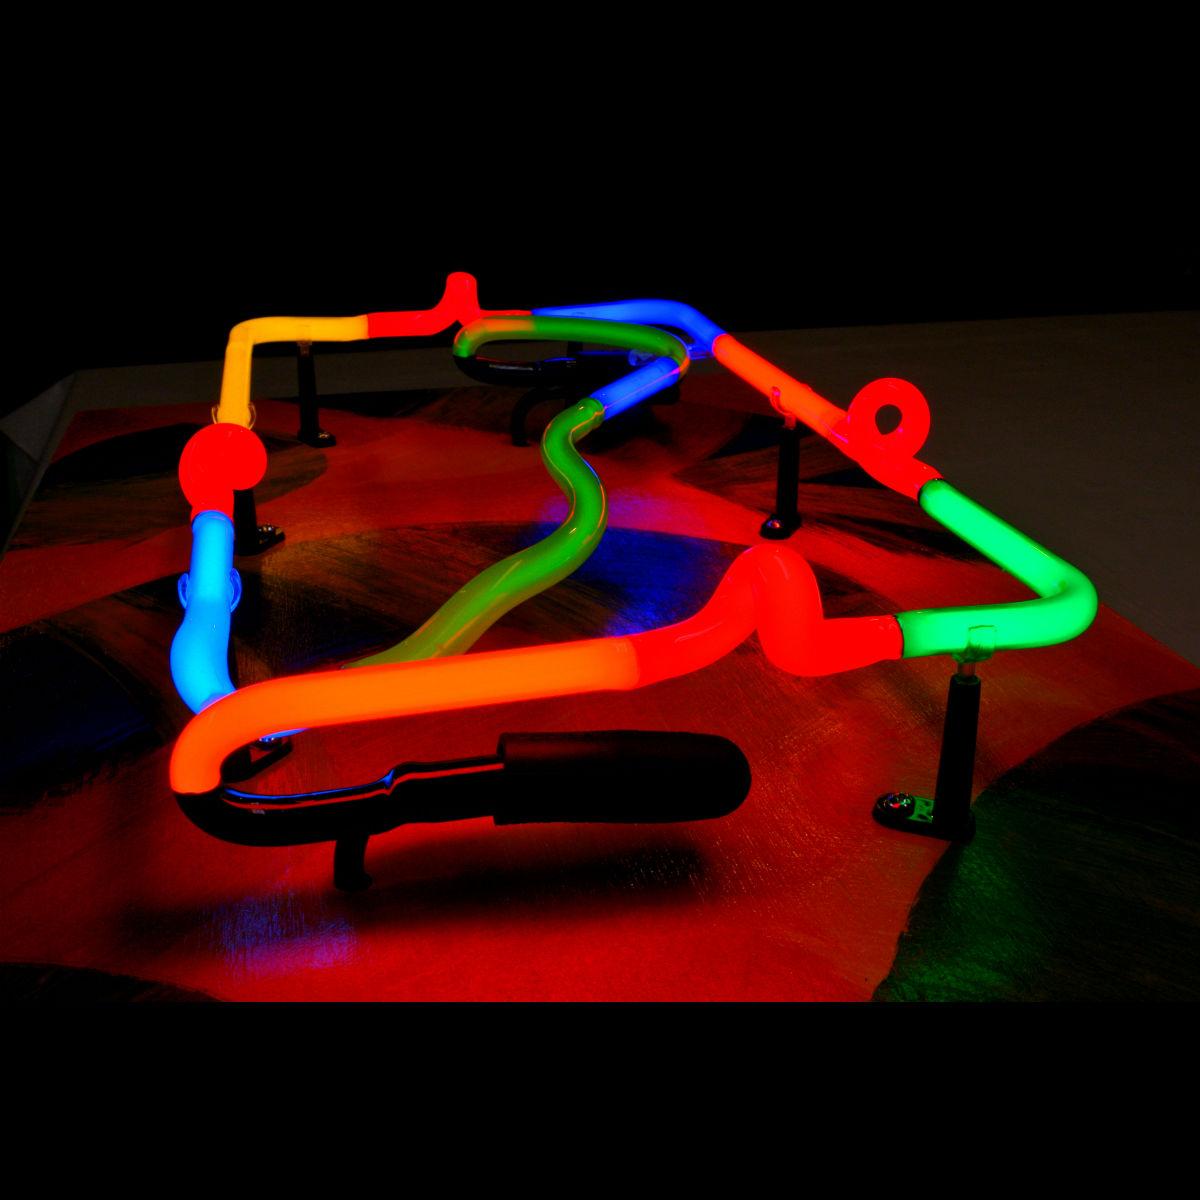 Cpntemporary Neon Art Sculptures in Stained Italian Neon Glass by John Barton - BartonNeonMagic.com